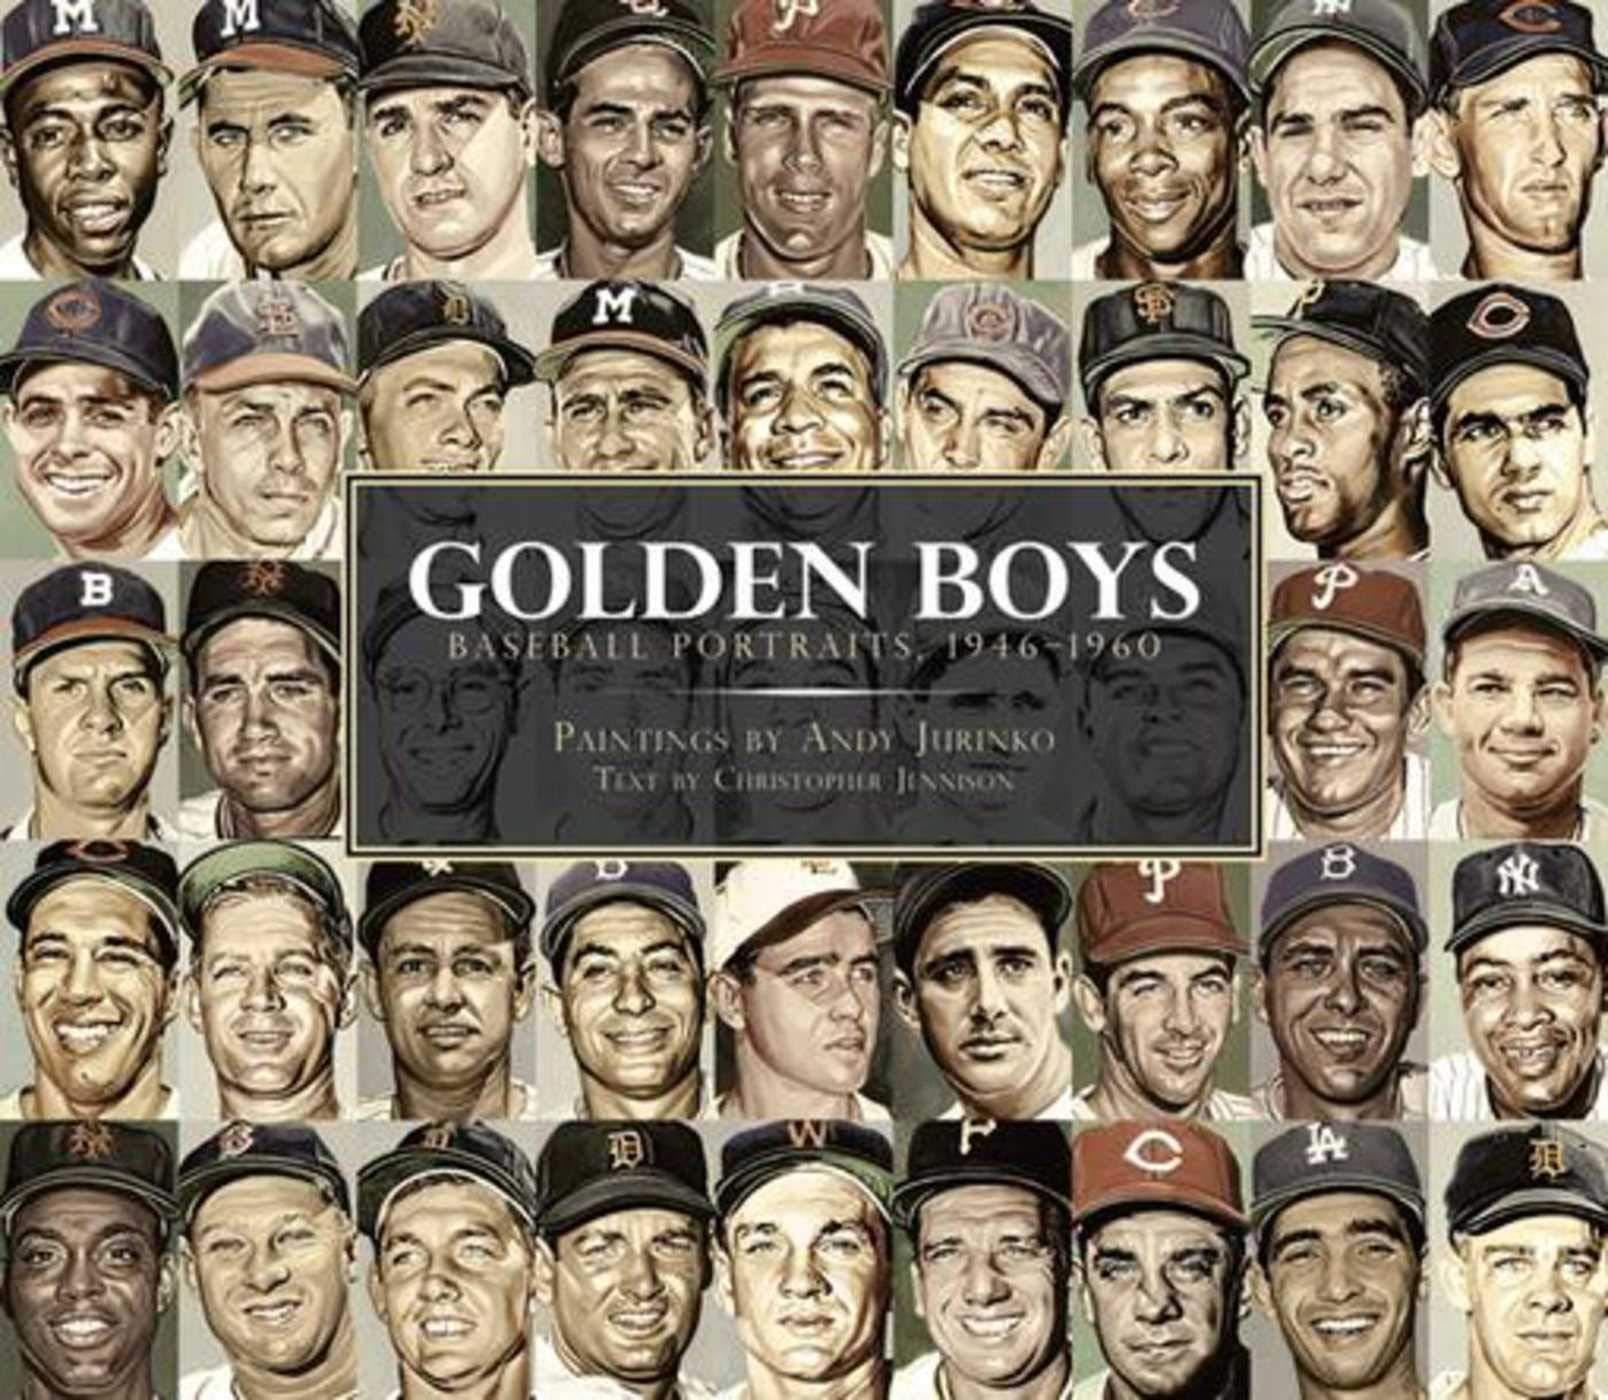 Golden Boys: Baseball Portraits, 1946-1960 by Skyhorse